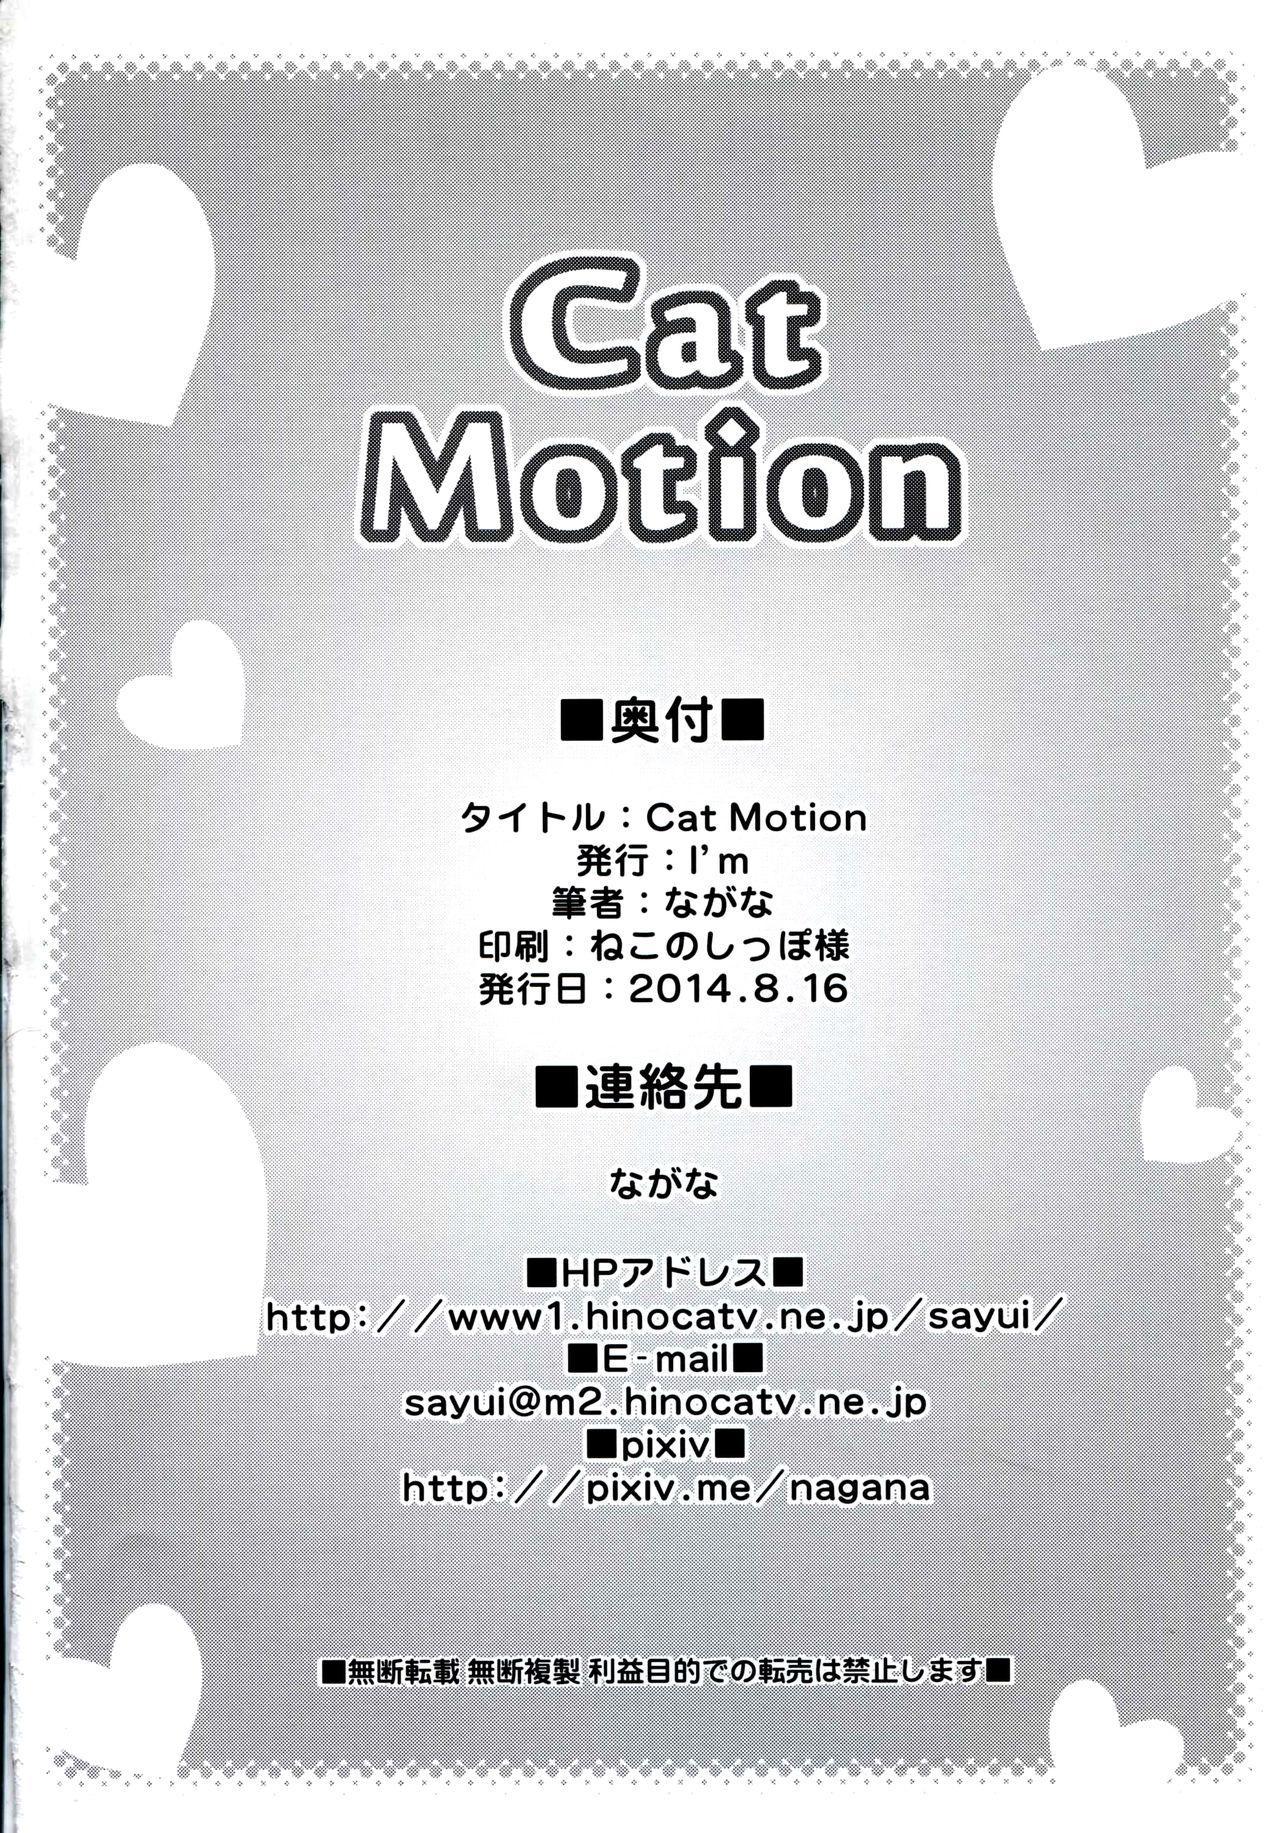 Cat Motion 21